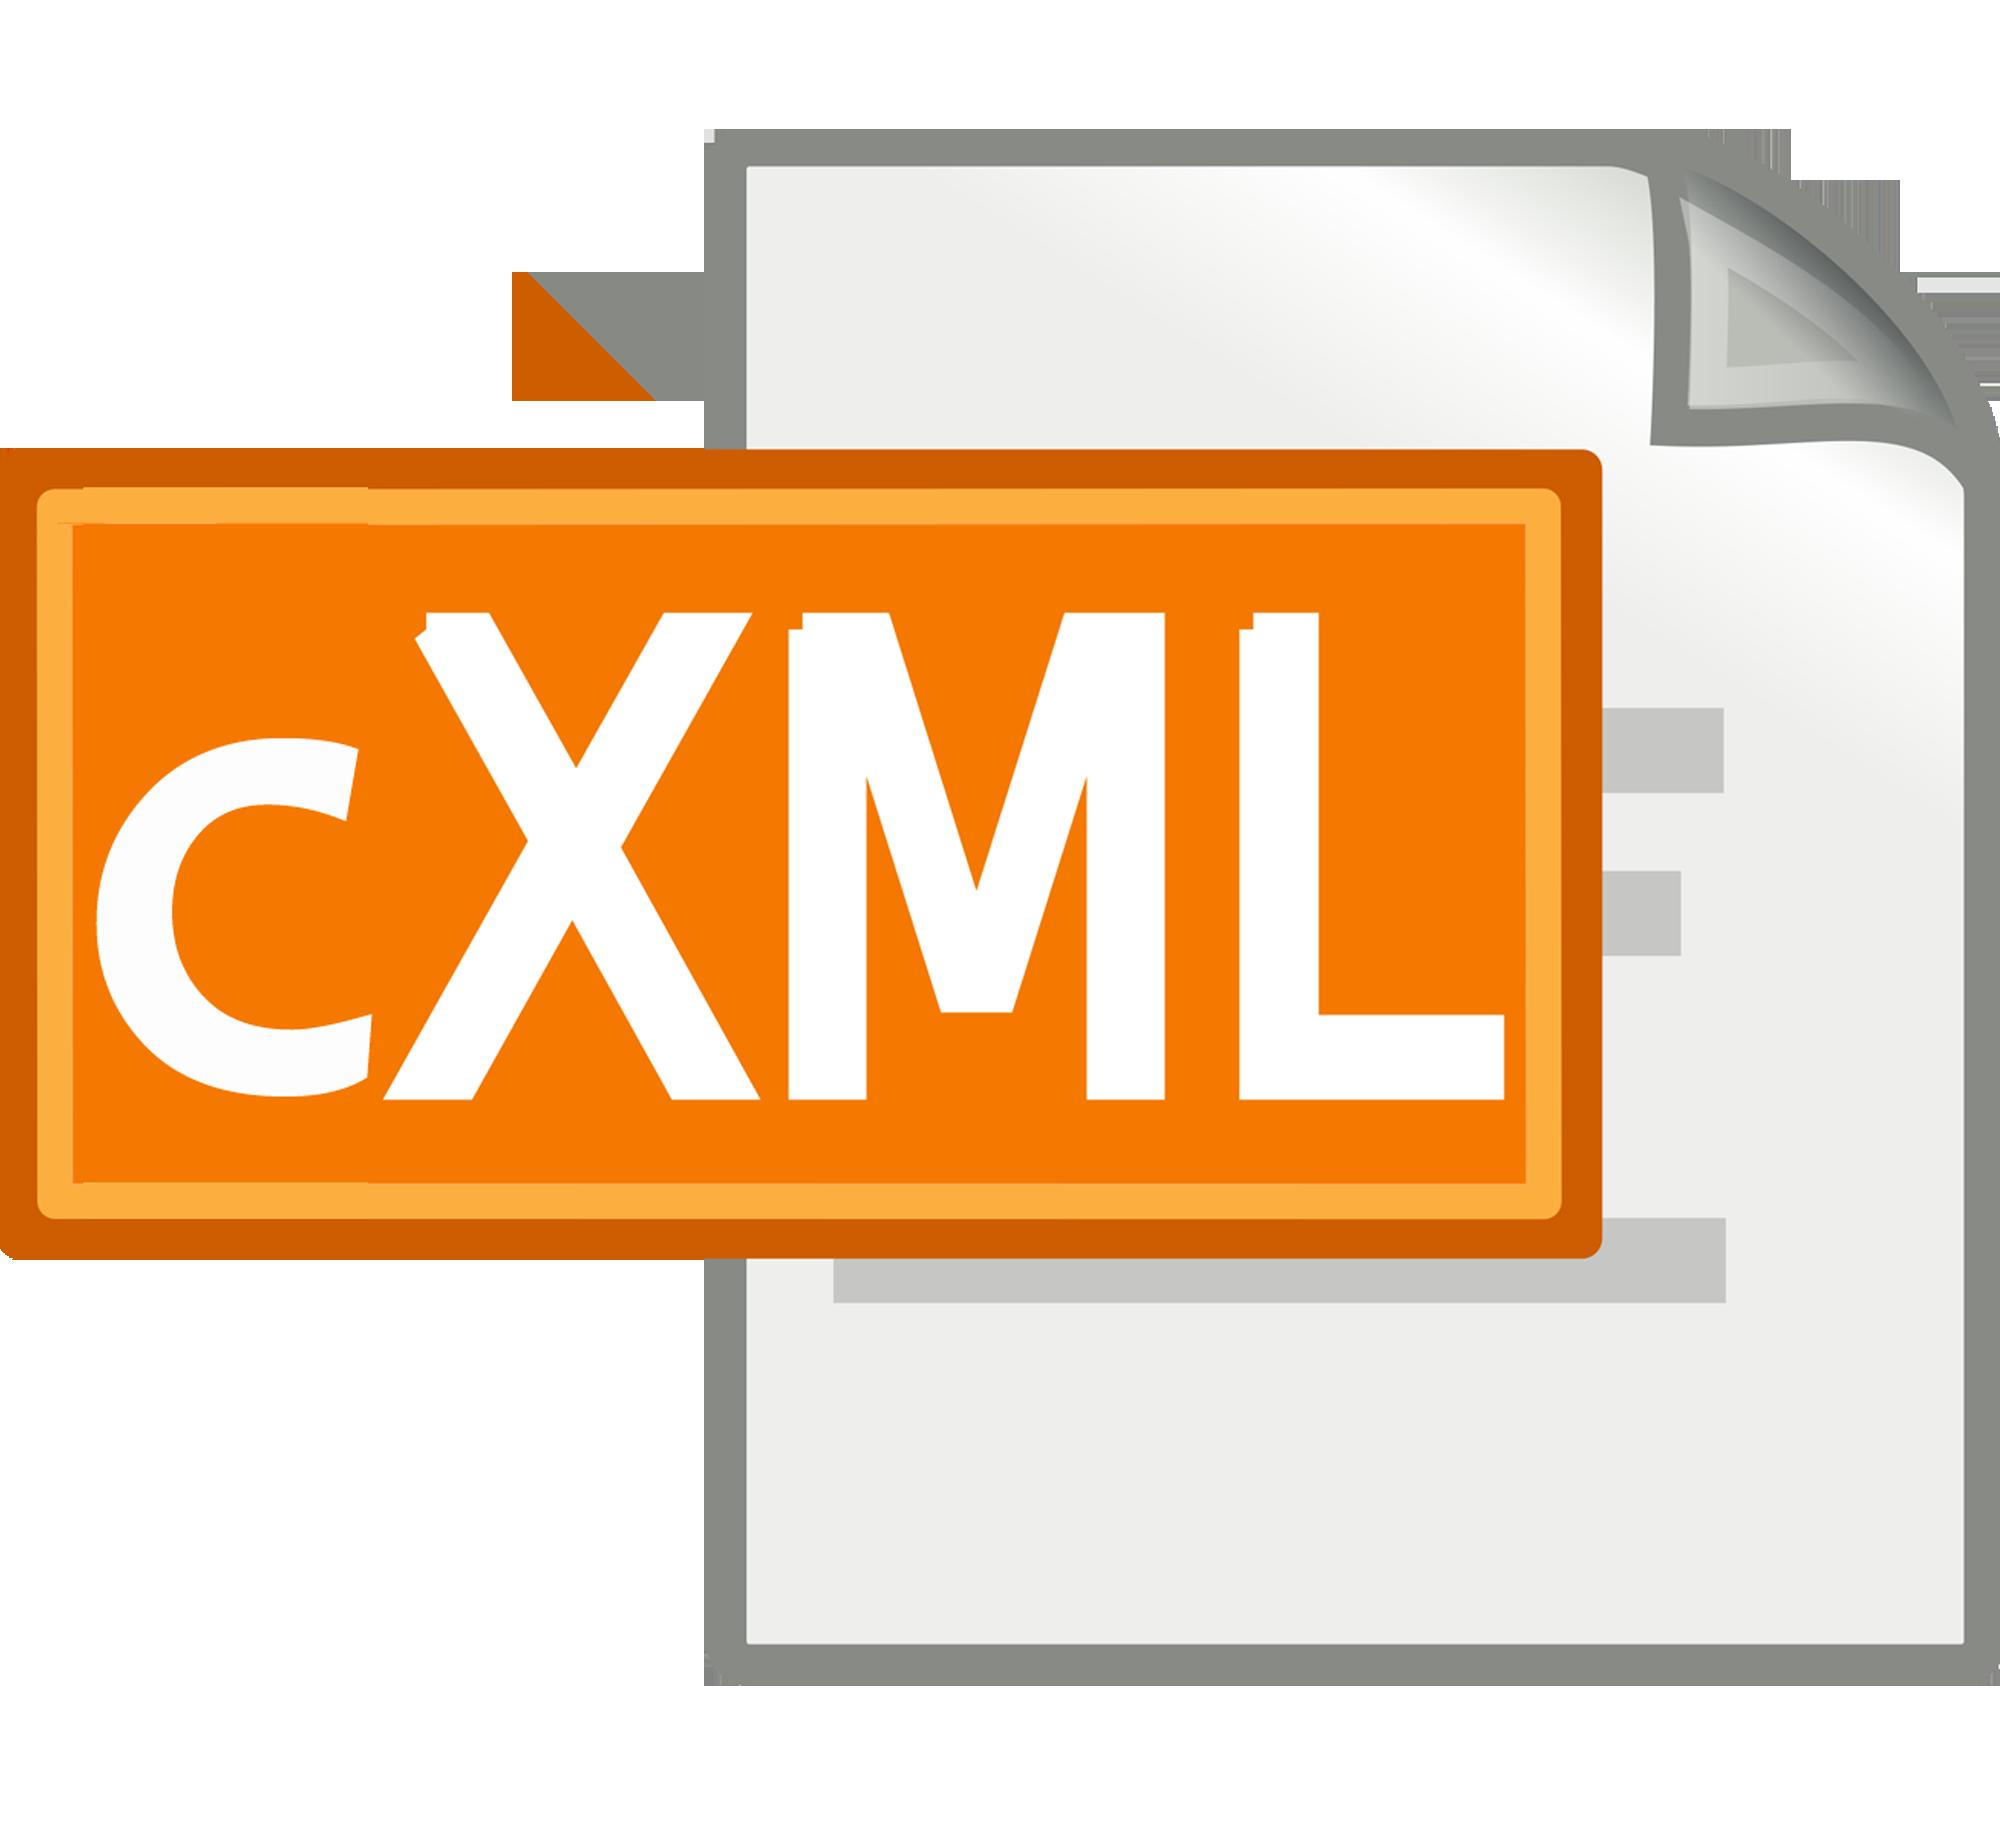 cXML Integration